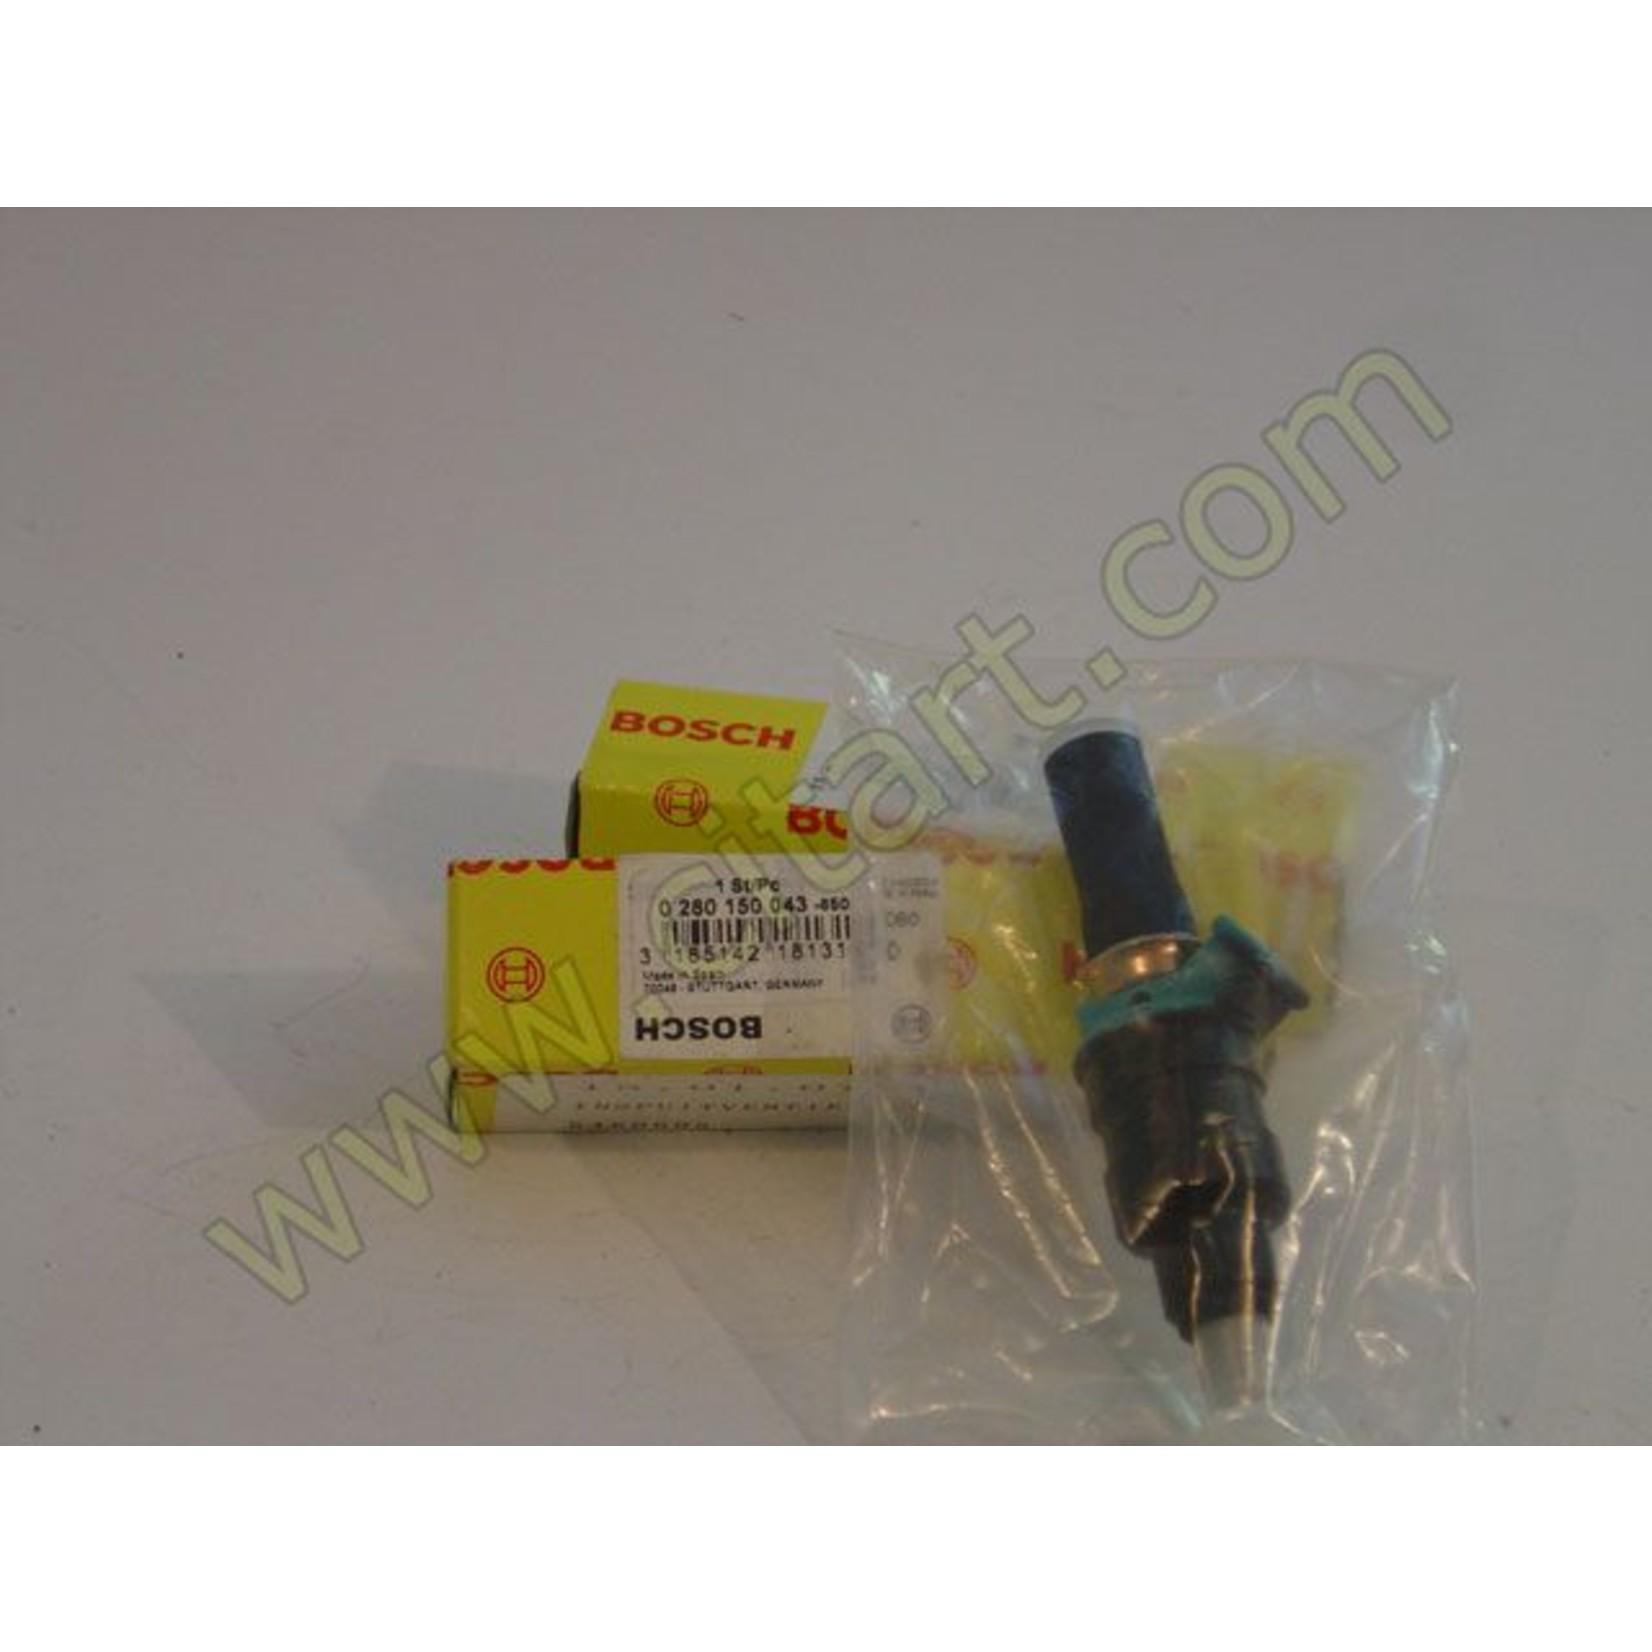 Petrol injector Nr Org: 5412352